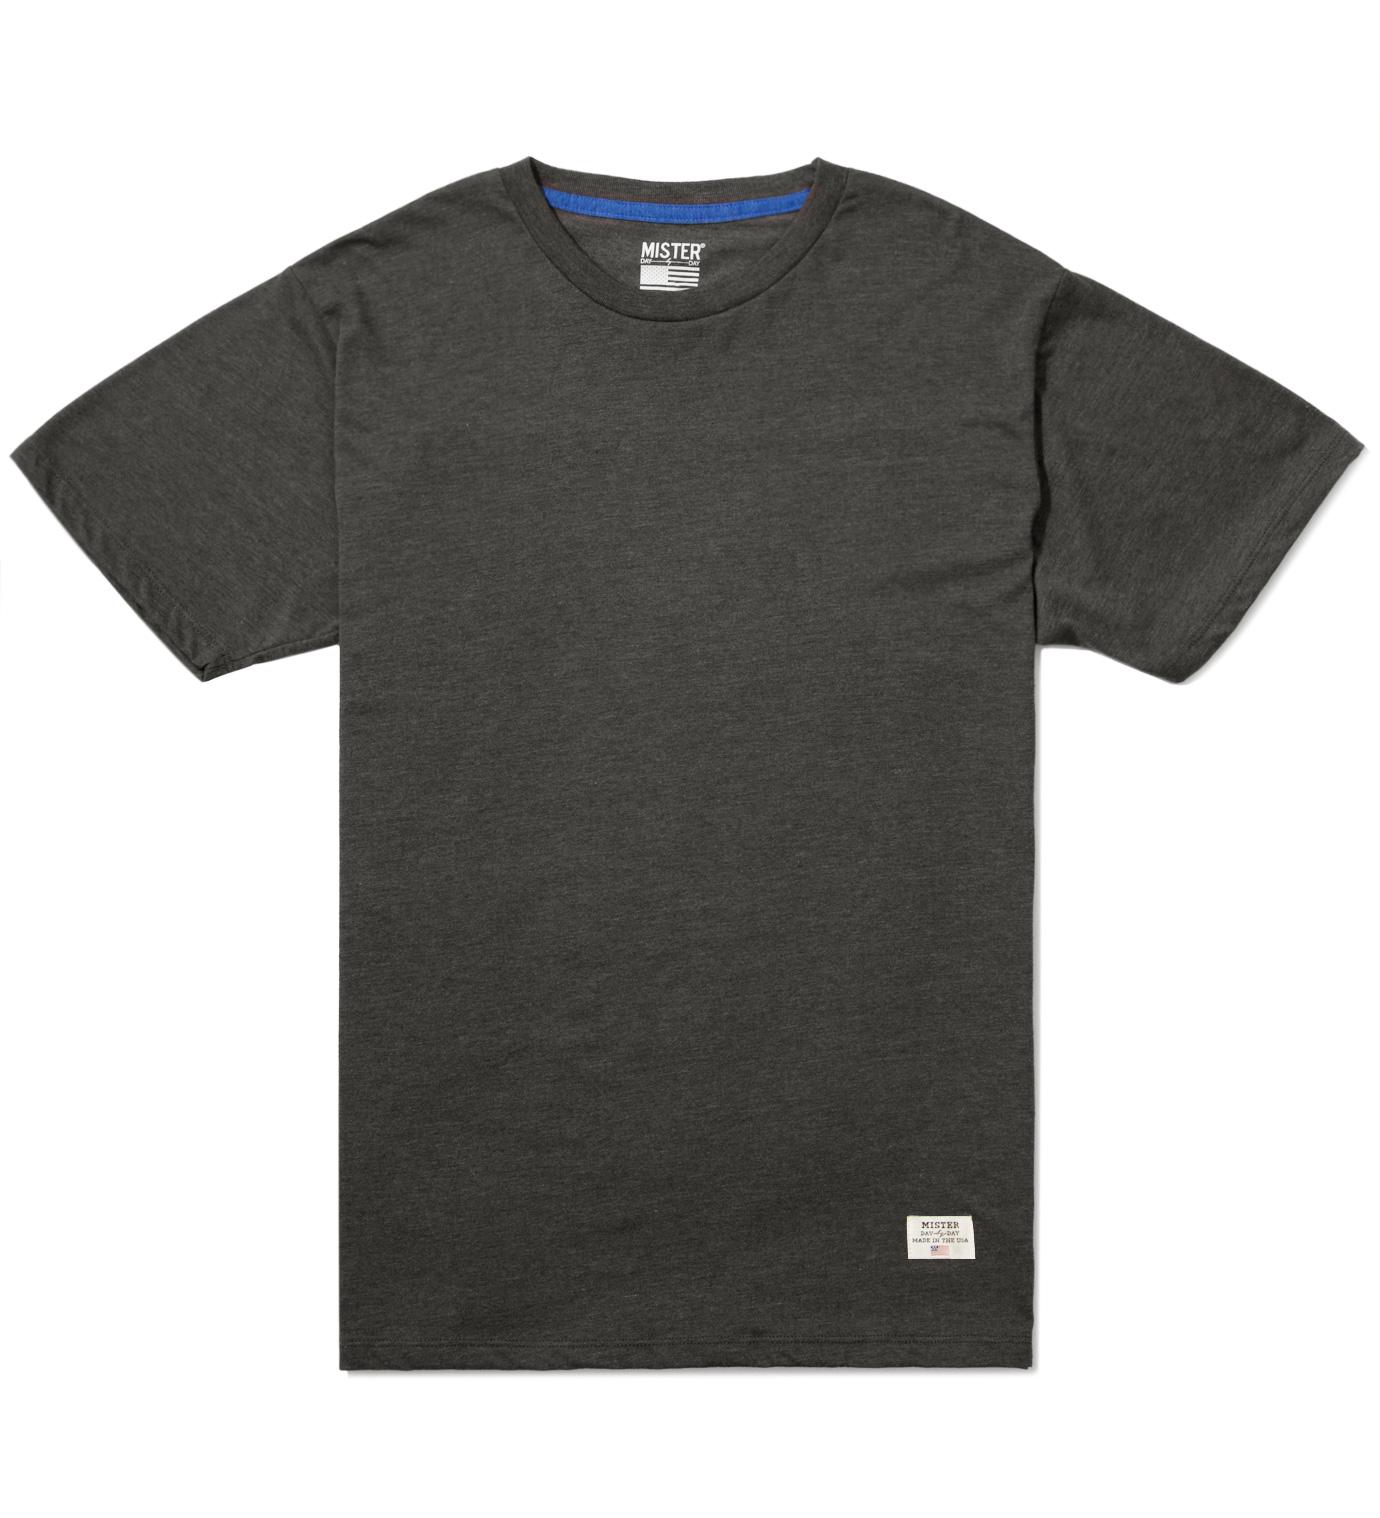 Mister Charcoal Mr. Tee Immediate T-Shirt